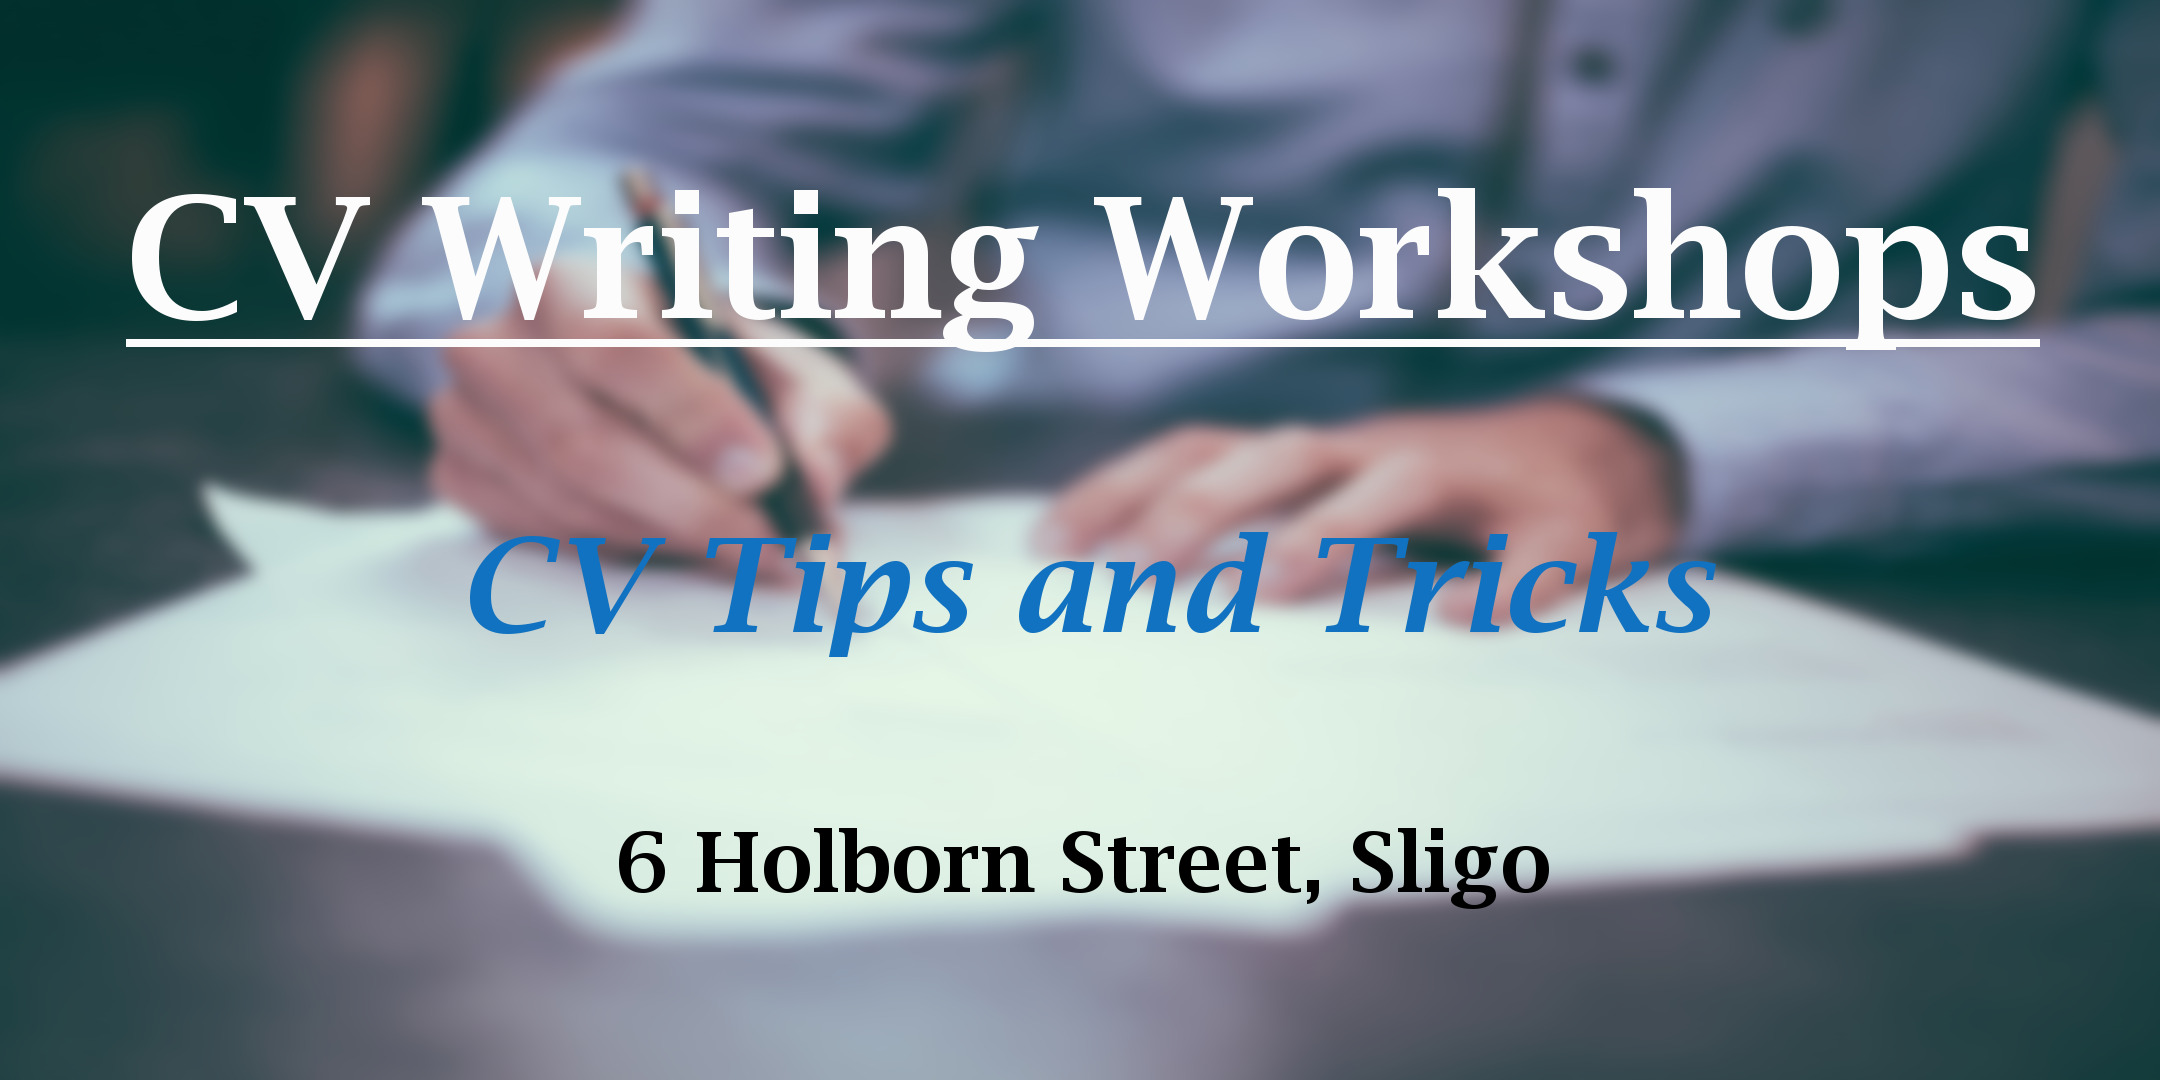 CV Writing Workshop - CV Tips and Tricks